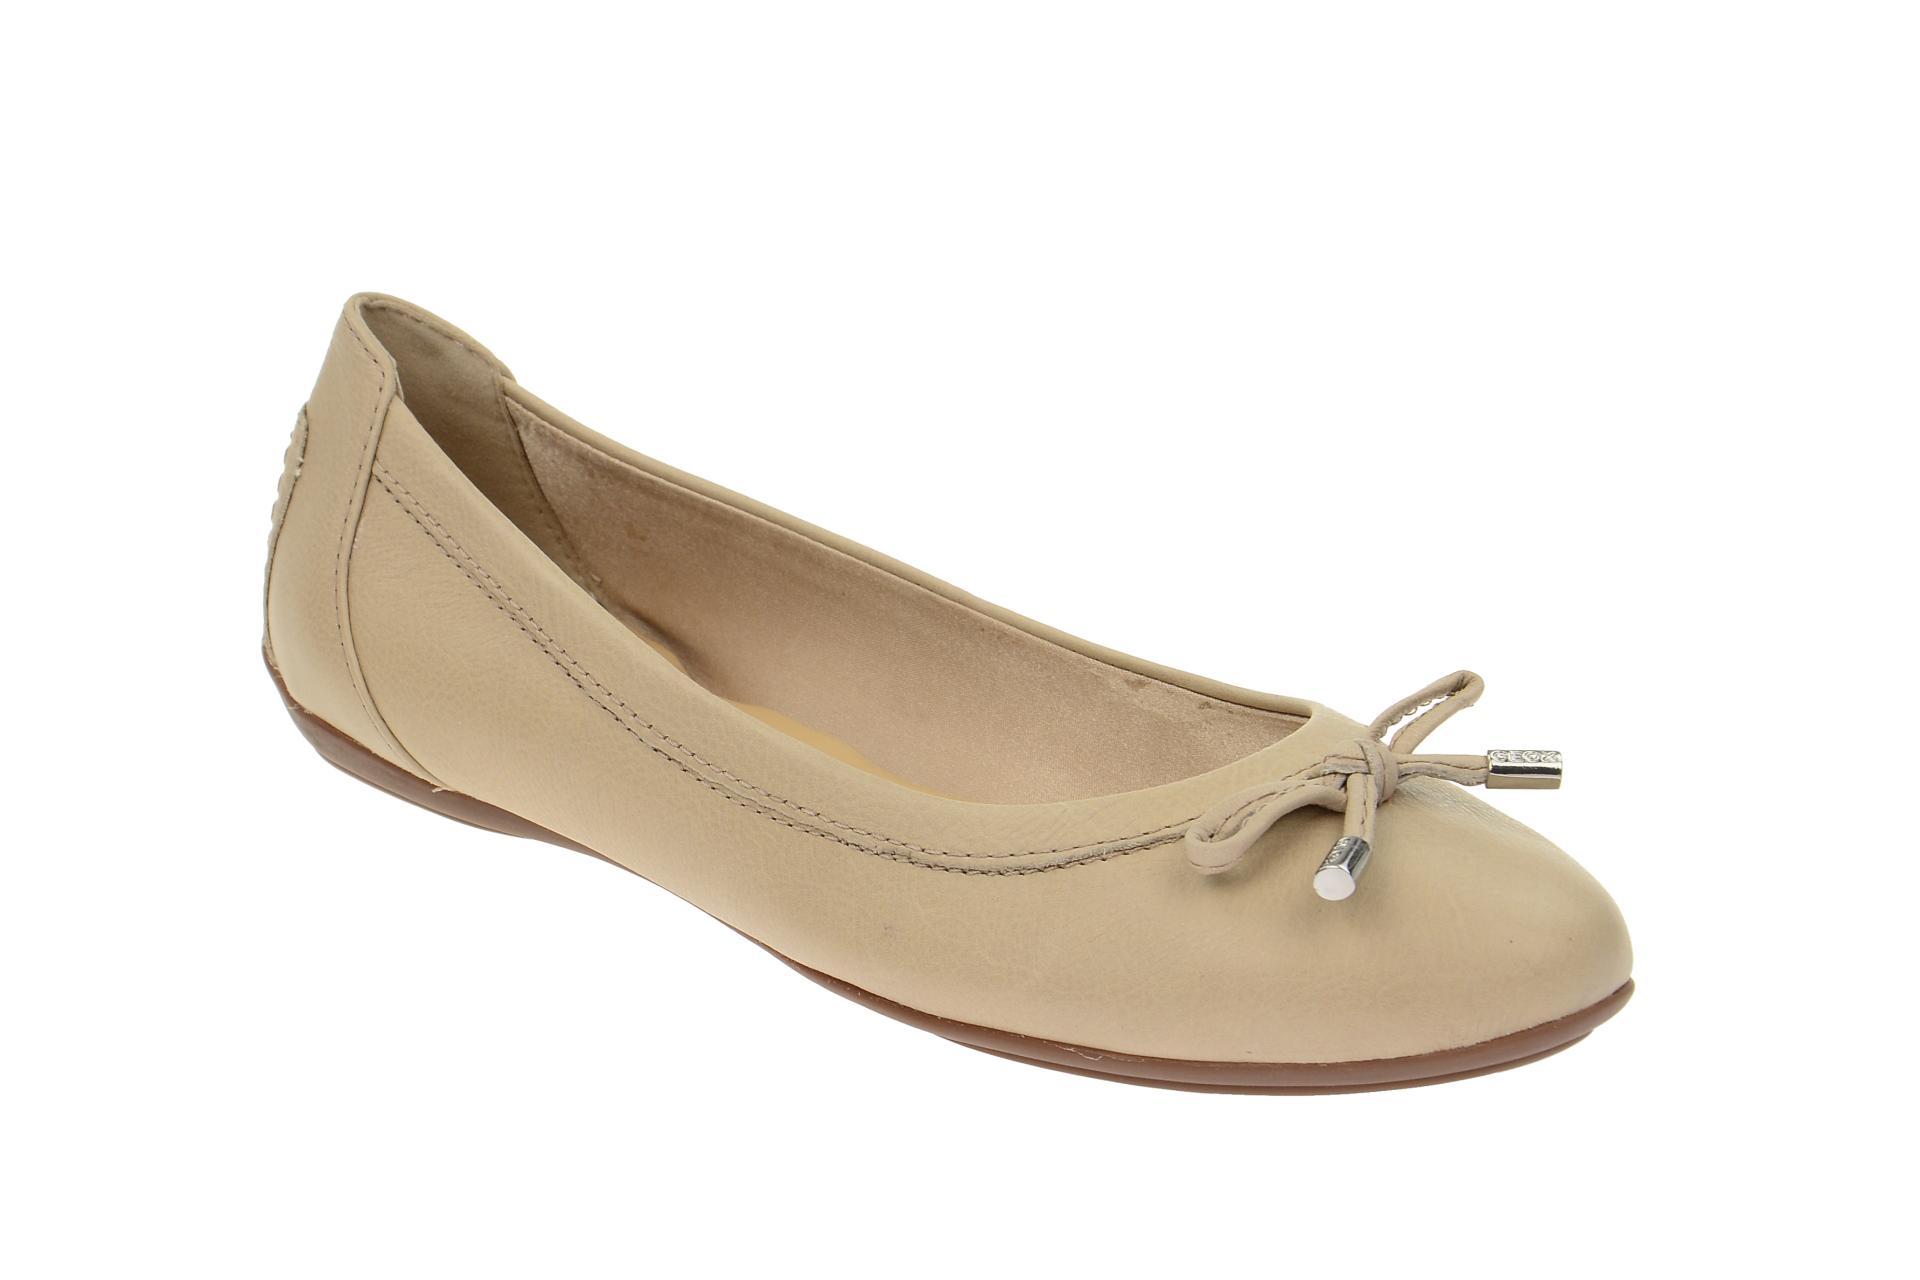 Geox CHARLENE Ballerinas - Damen Halb Zapatos  - - - Slipper beige NEU 4e20a2